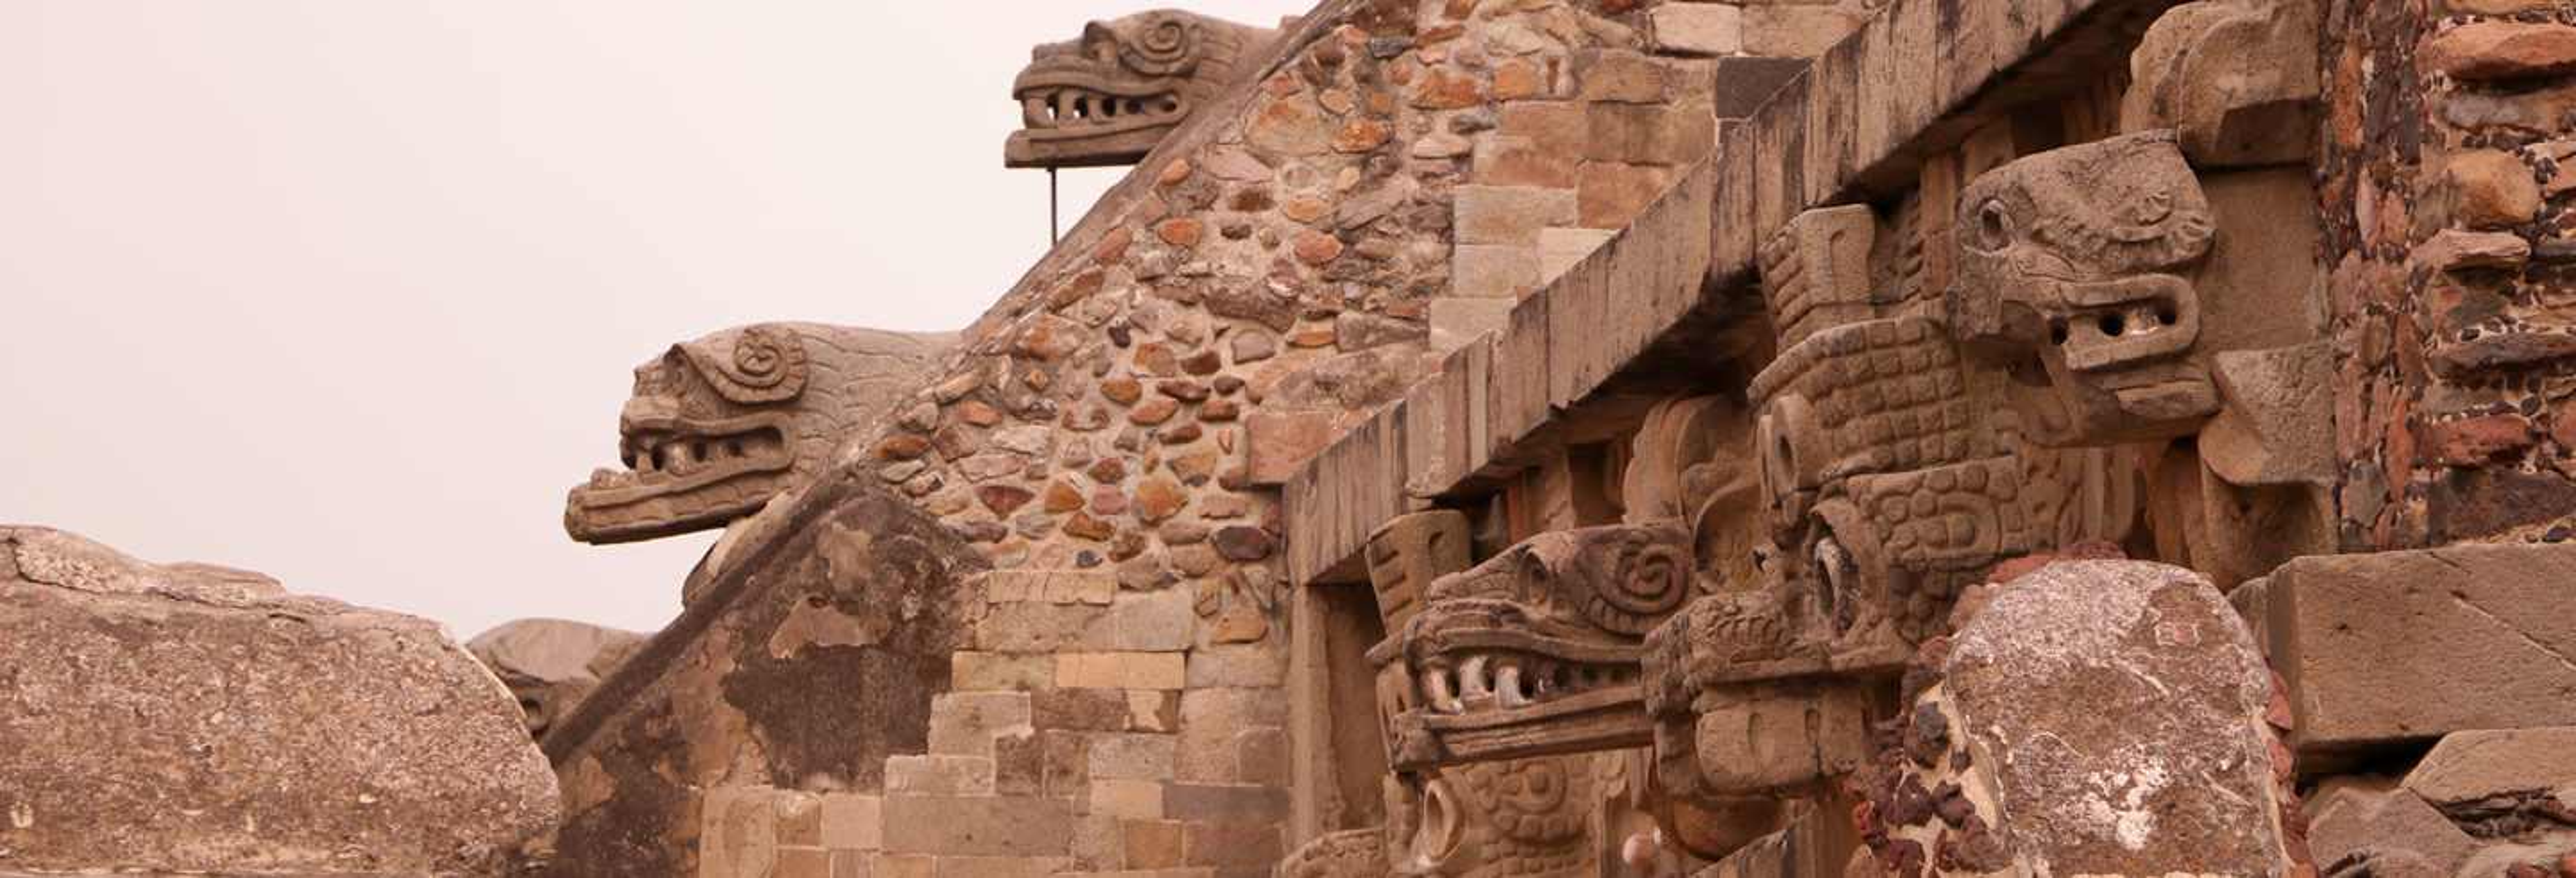 Tour privado por Teotihuacán